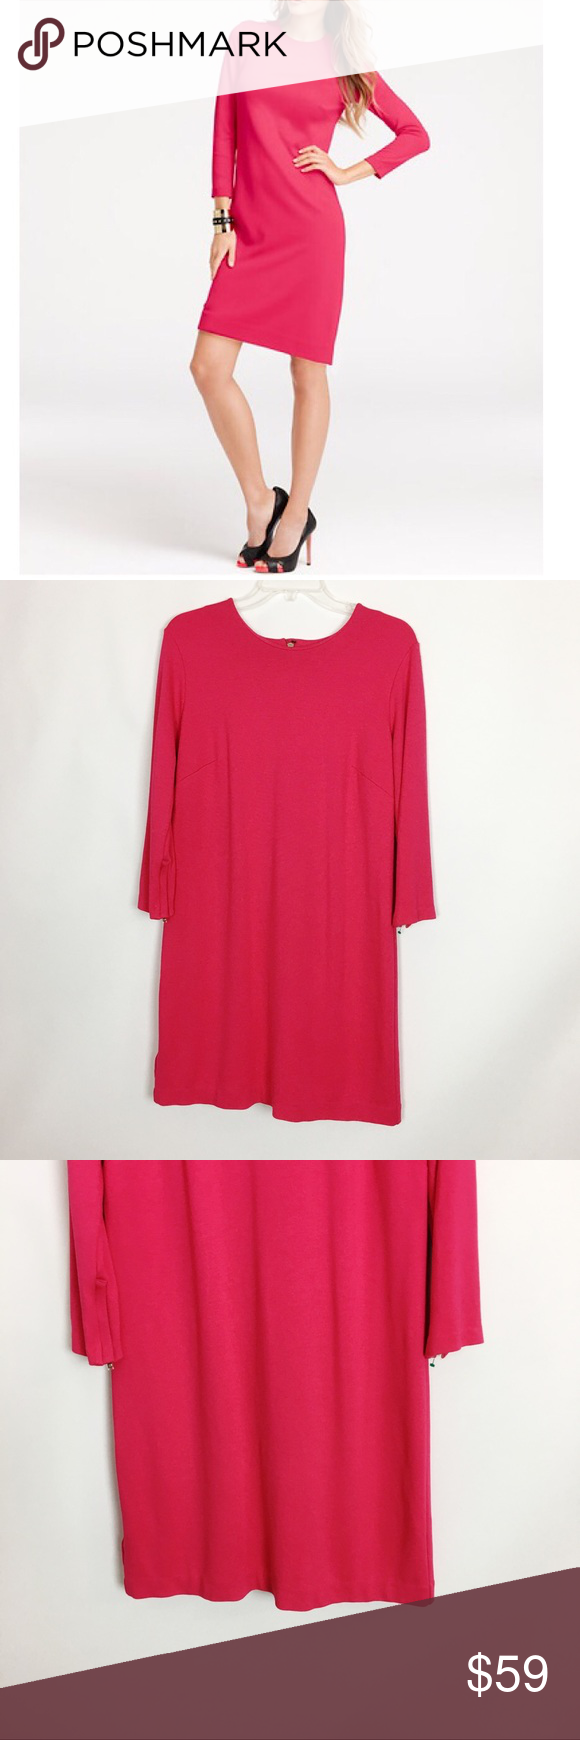 Ann Taylor Hot Pink 3 4 Sleeve Shift Dress 12 Clothes Design Dresses Shift Dress [ 1740 x 580 Pixel ]